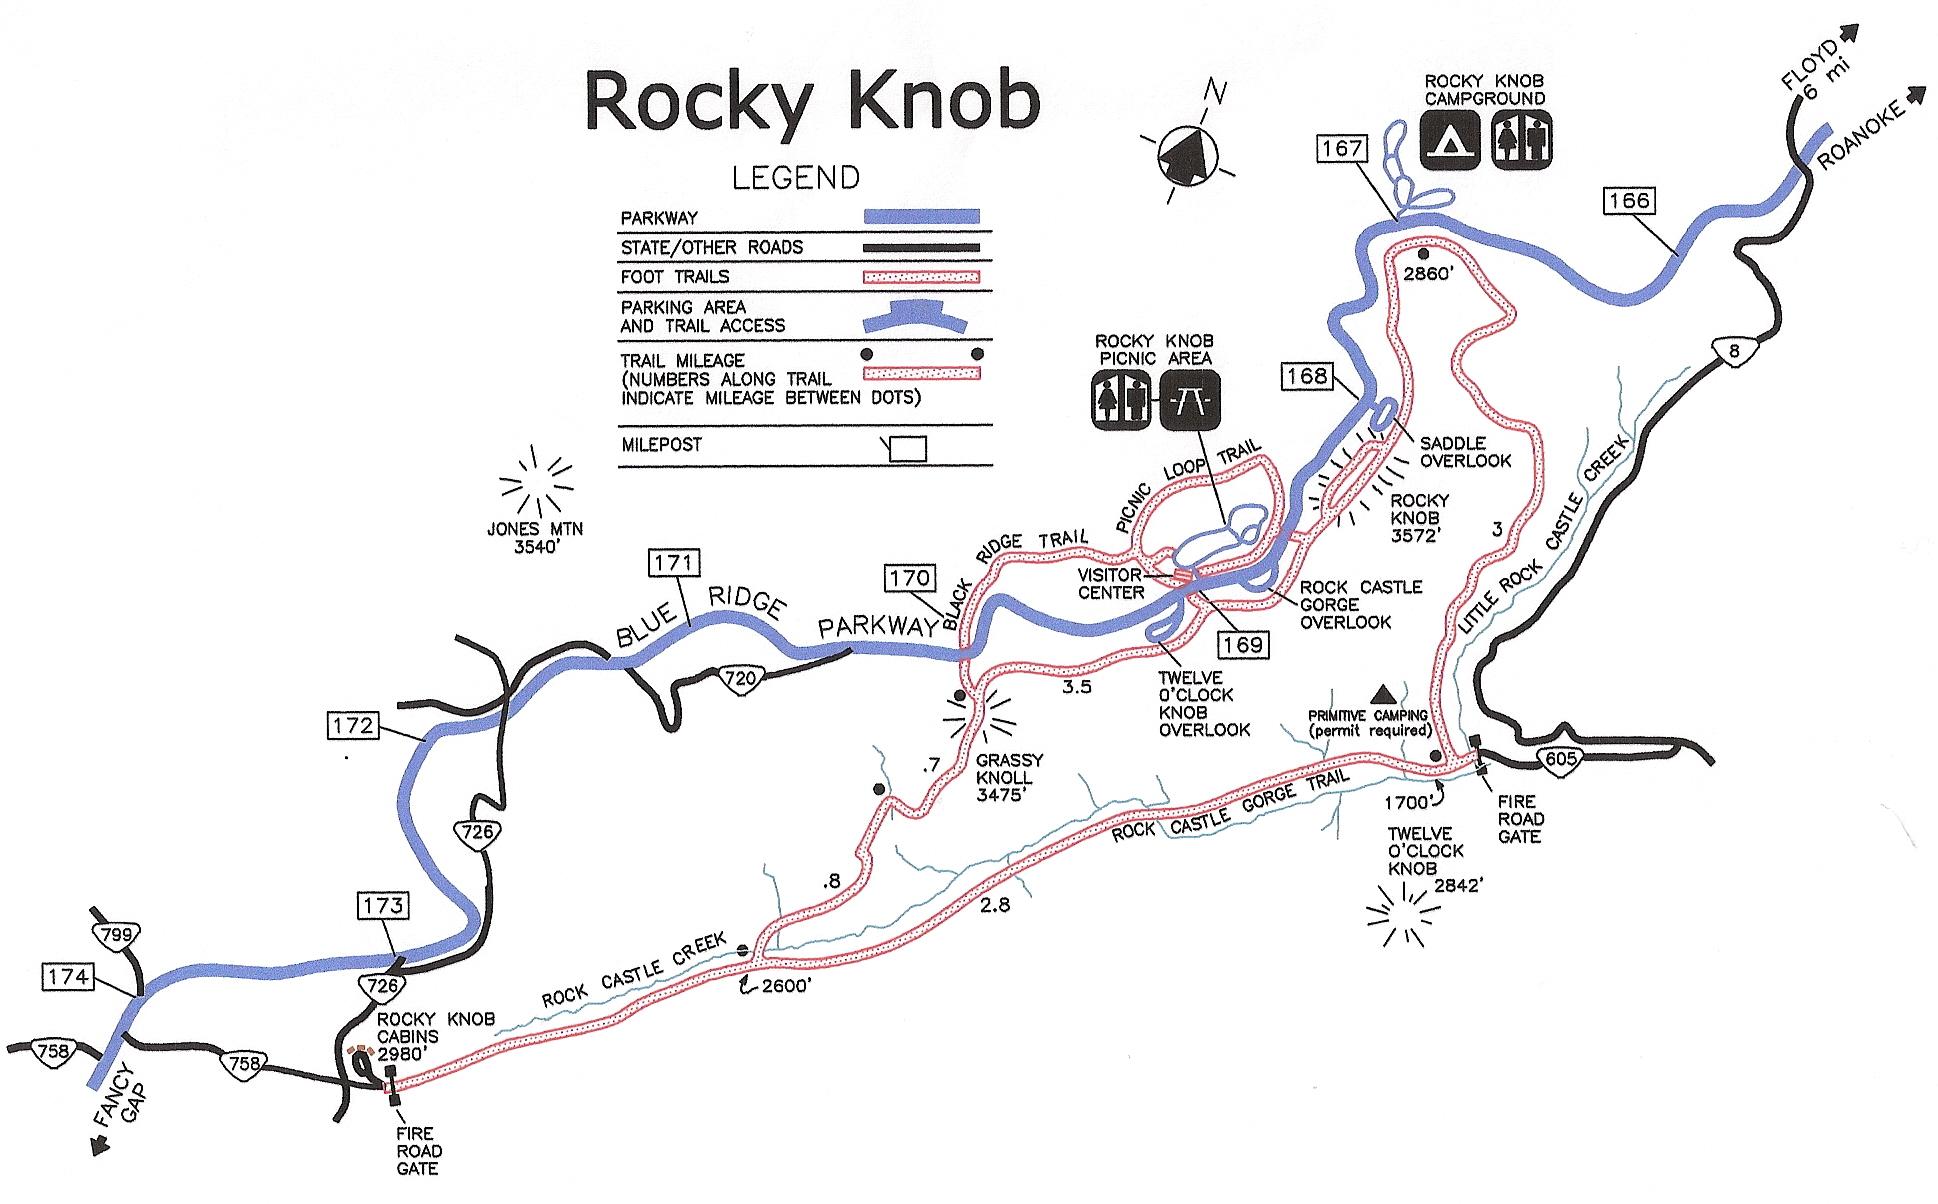 Rocky Knob Recreational Area